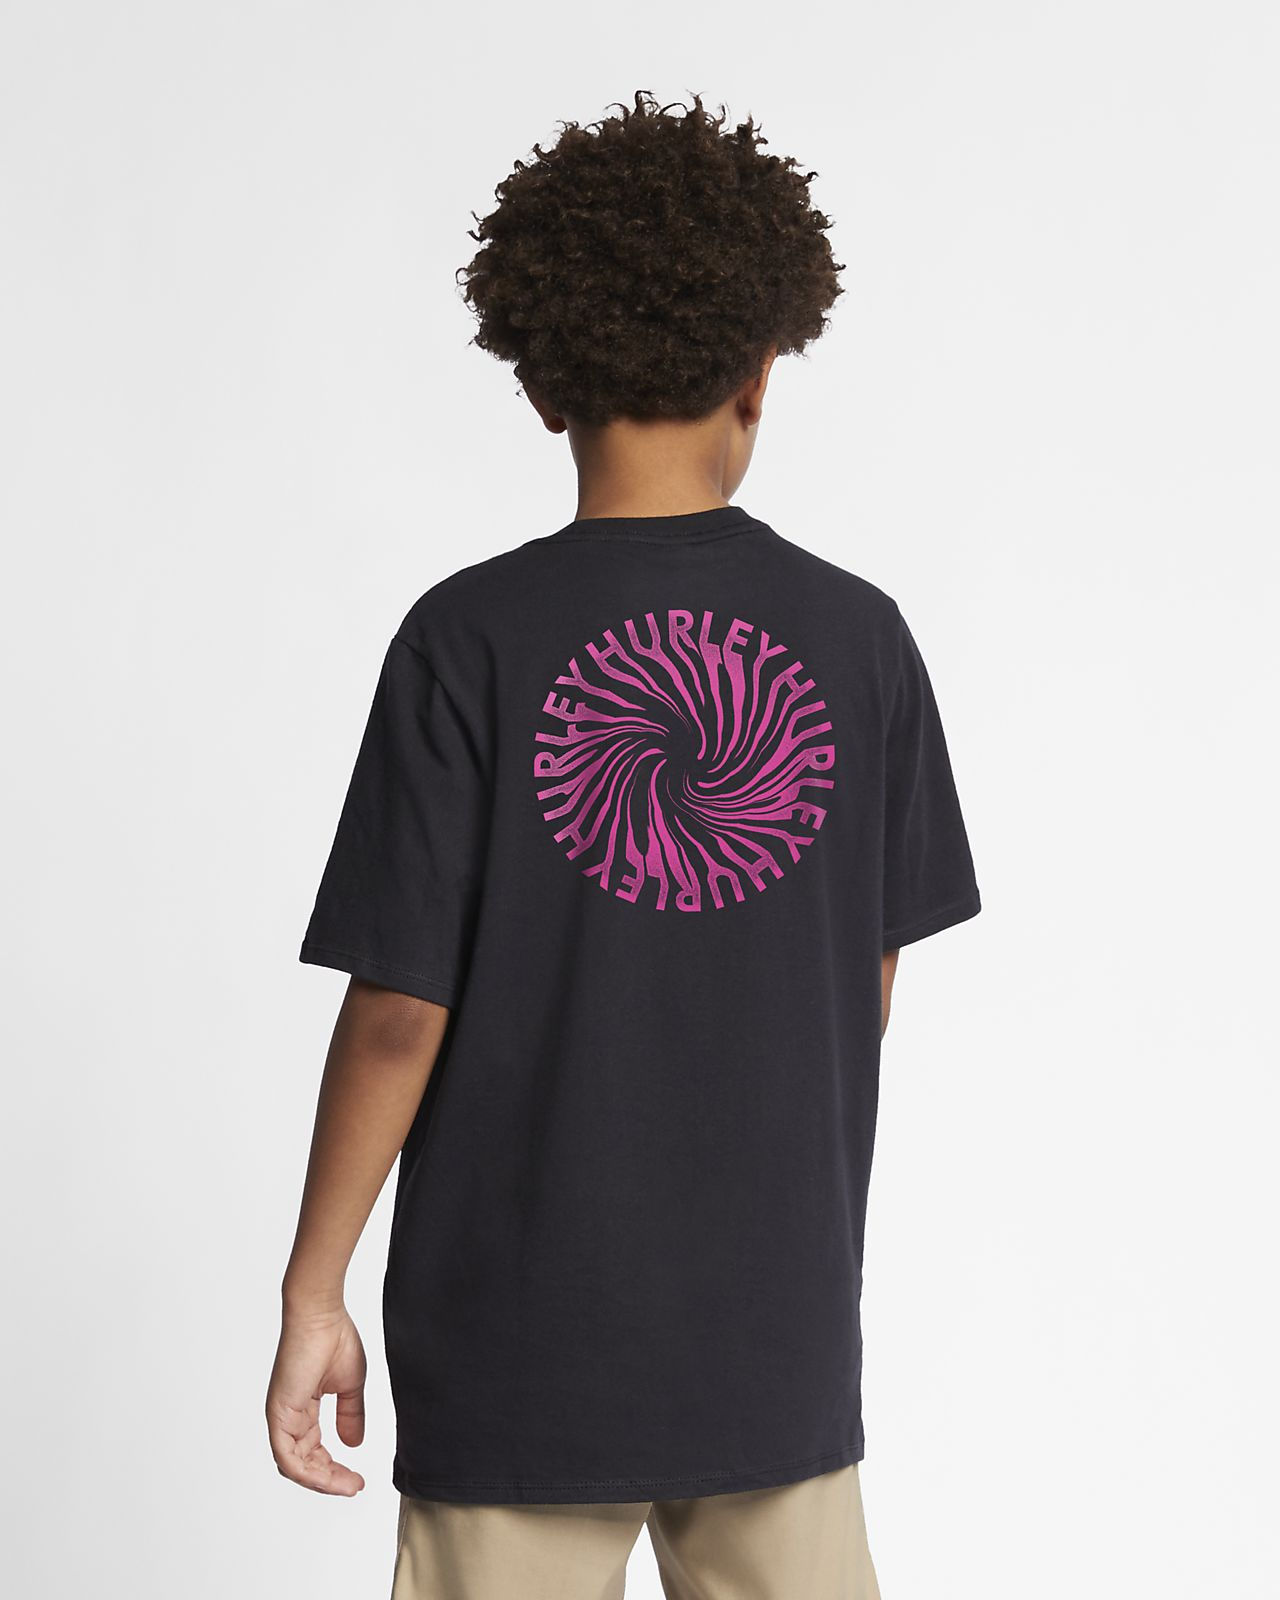 Hurley Premium Wormhole Jungen-T-Shirt